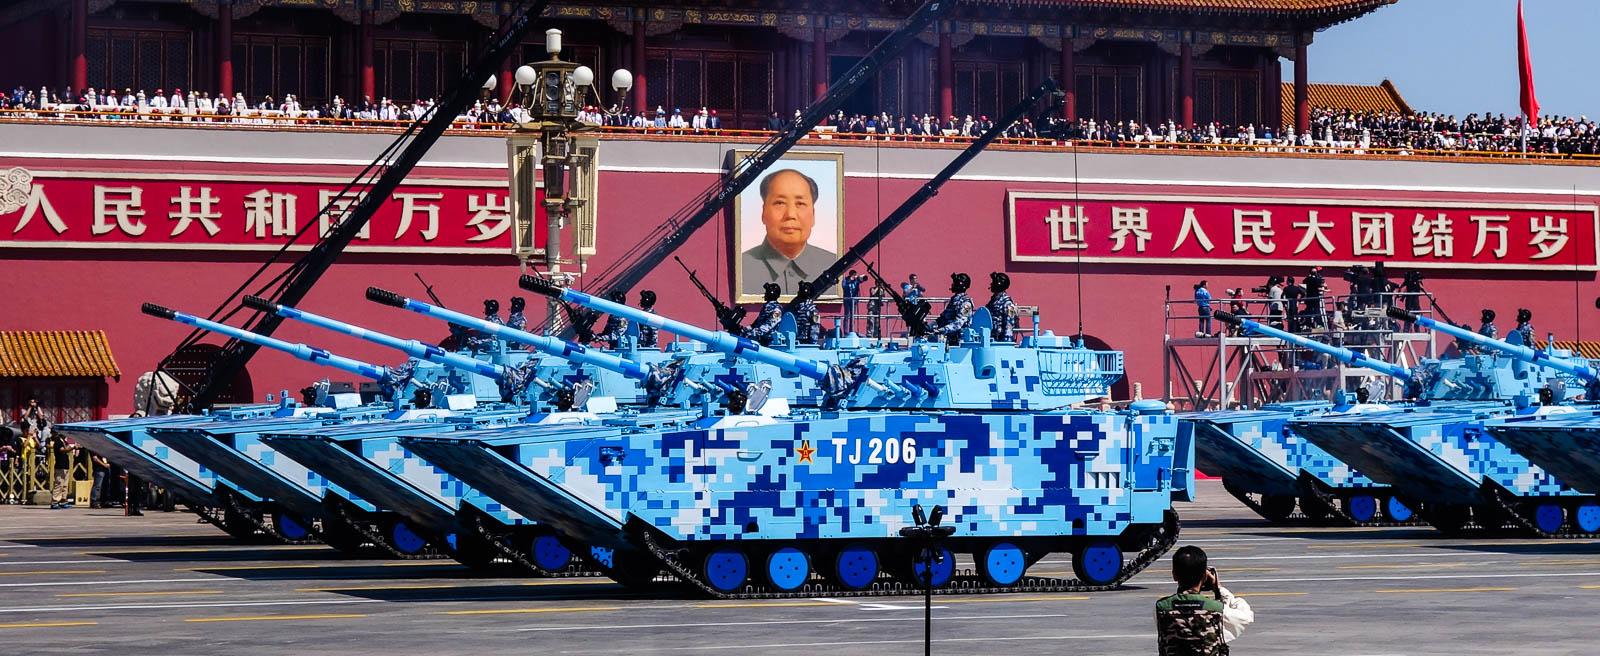 beijing-china-military-parade-2015-29